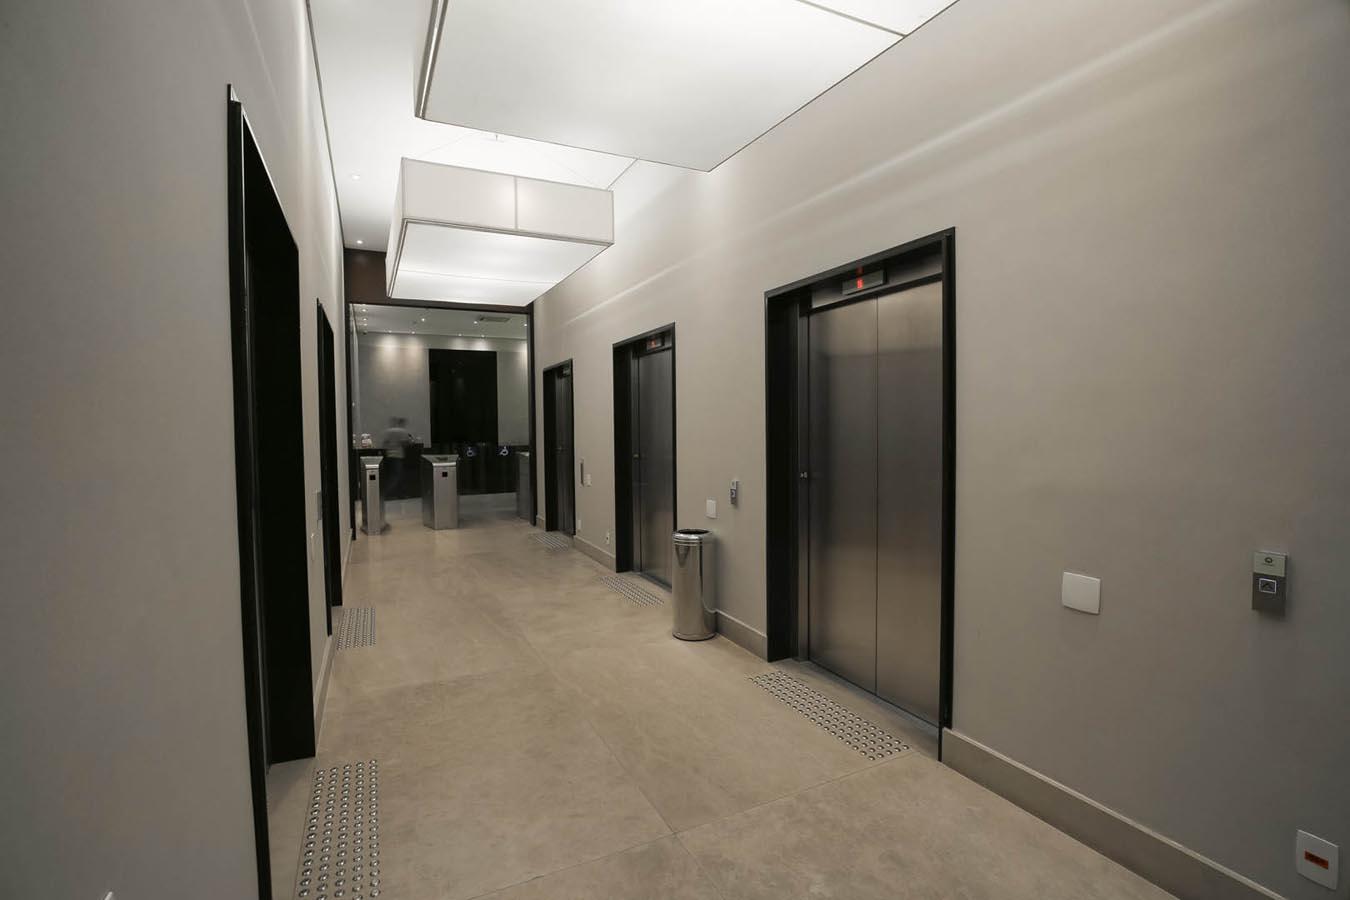 Foto do hall de elevadores